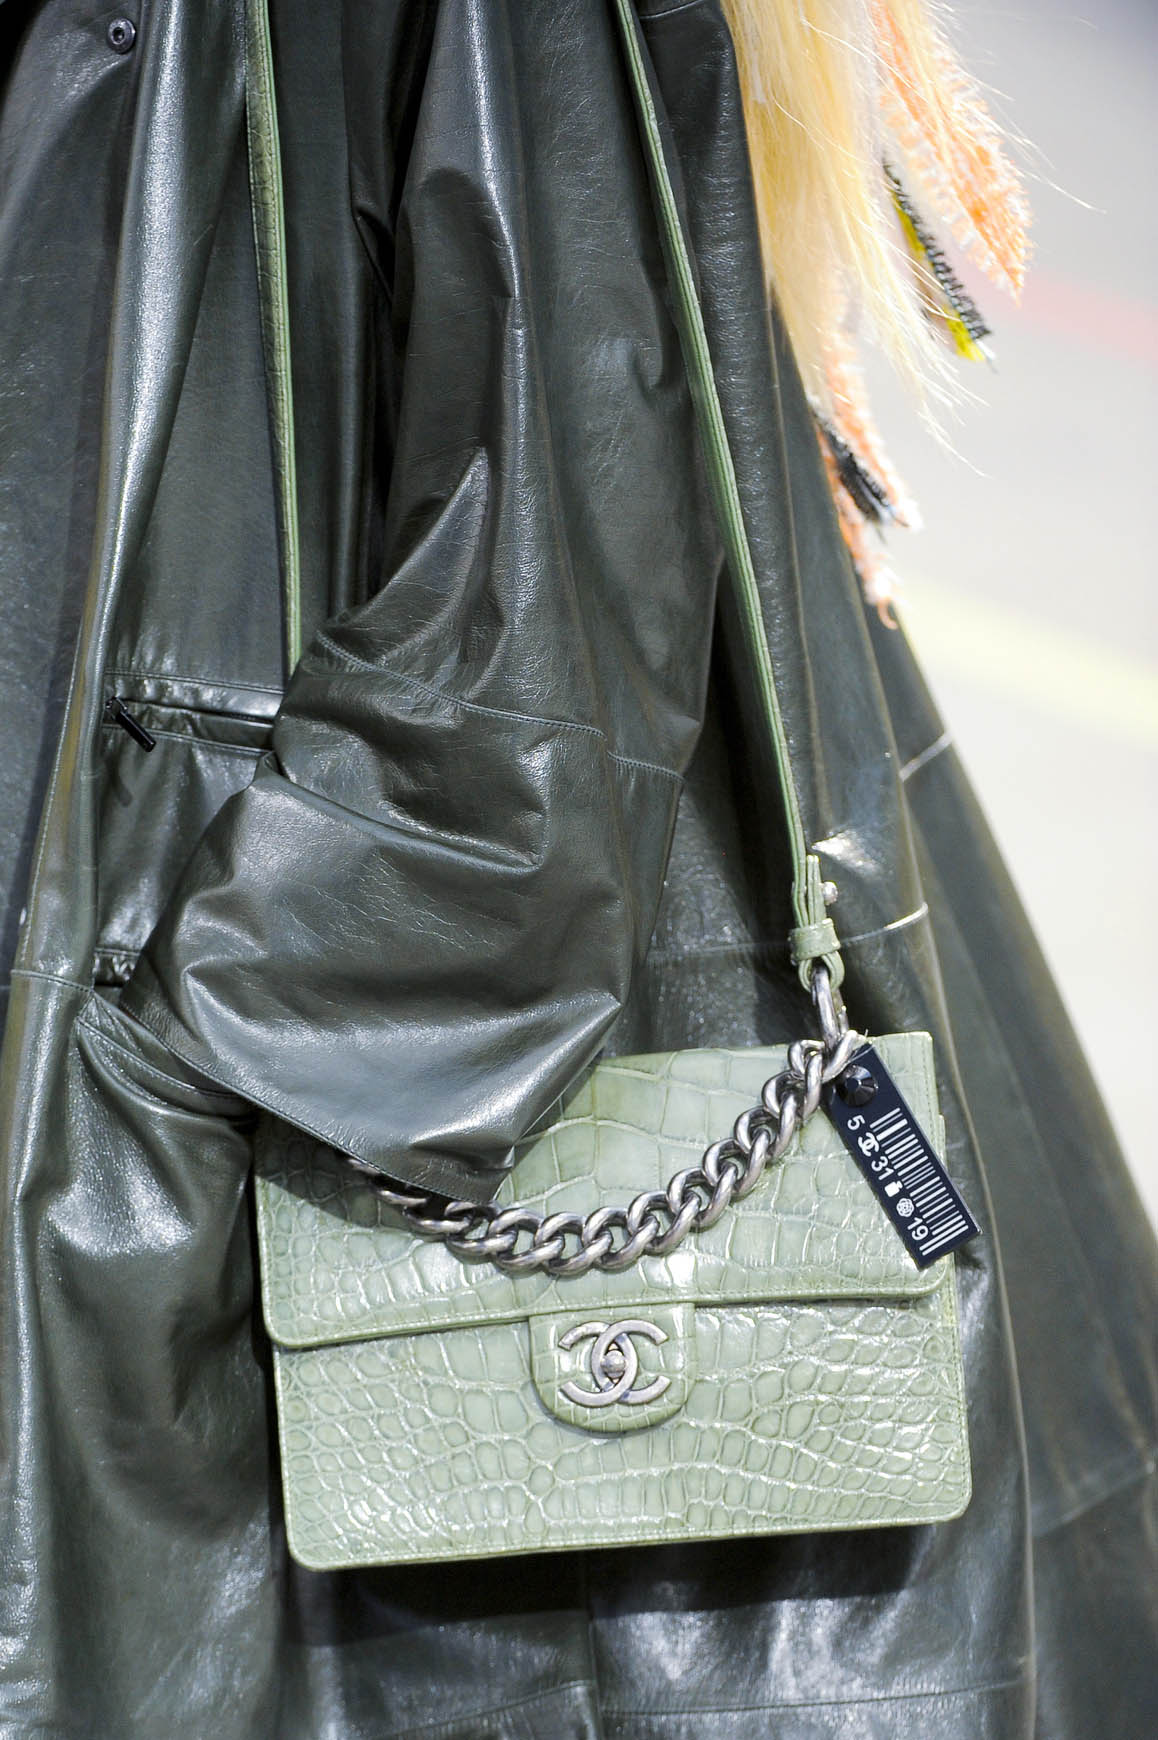 Chanel Alligator Bag Fall Winter 2014 Exotics